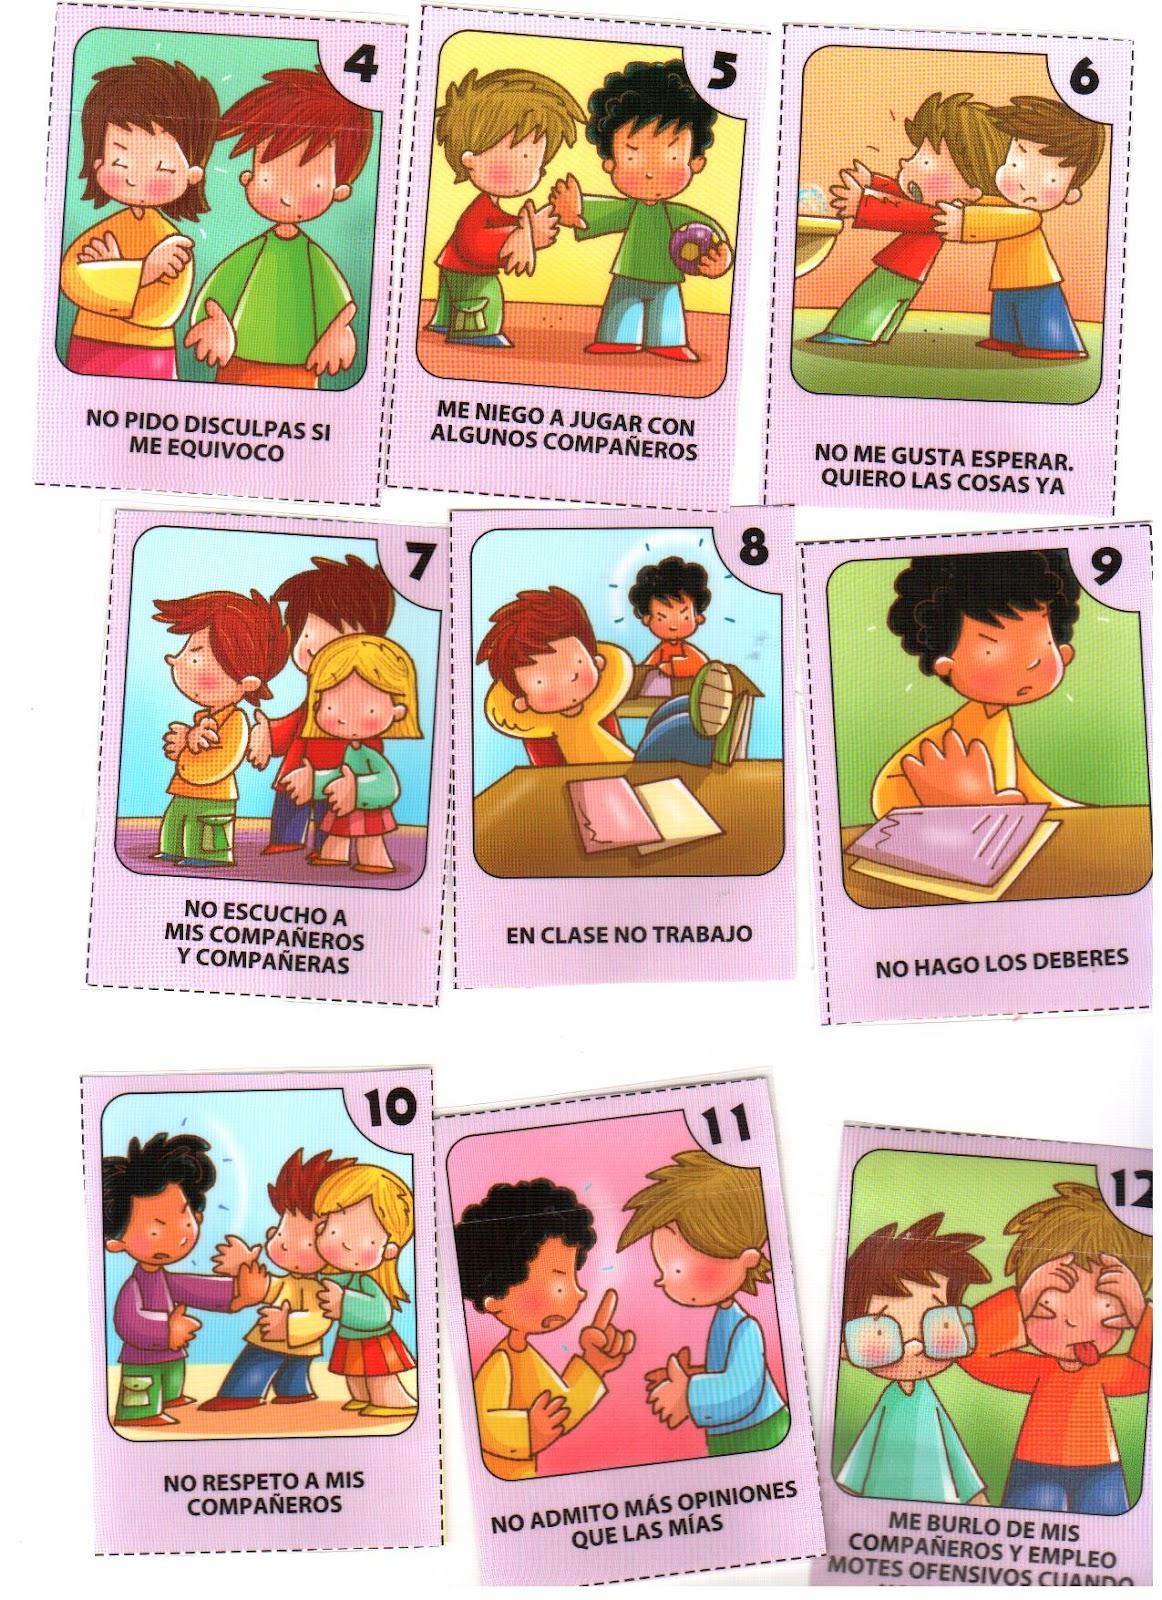 Cuentos infantiles ilustrados online dating 8